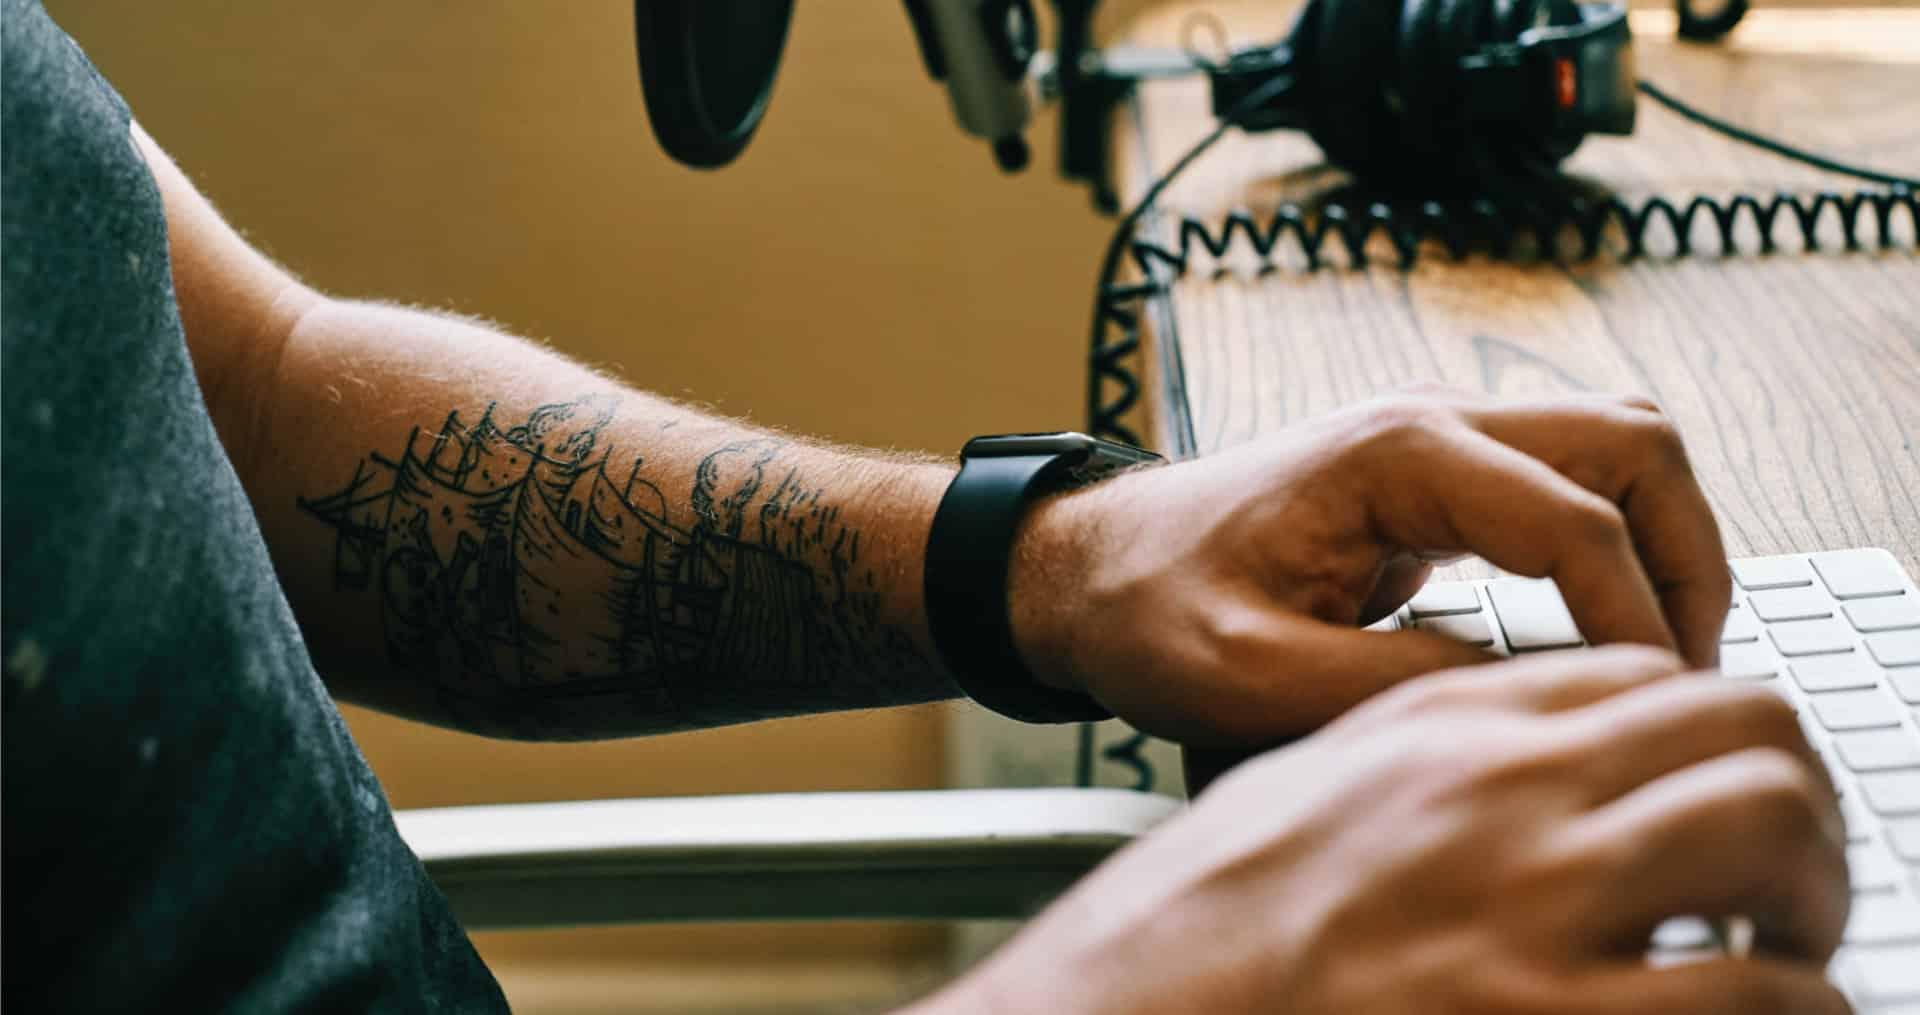 man manually transcribing using Google Docs